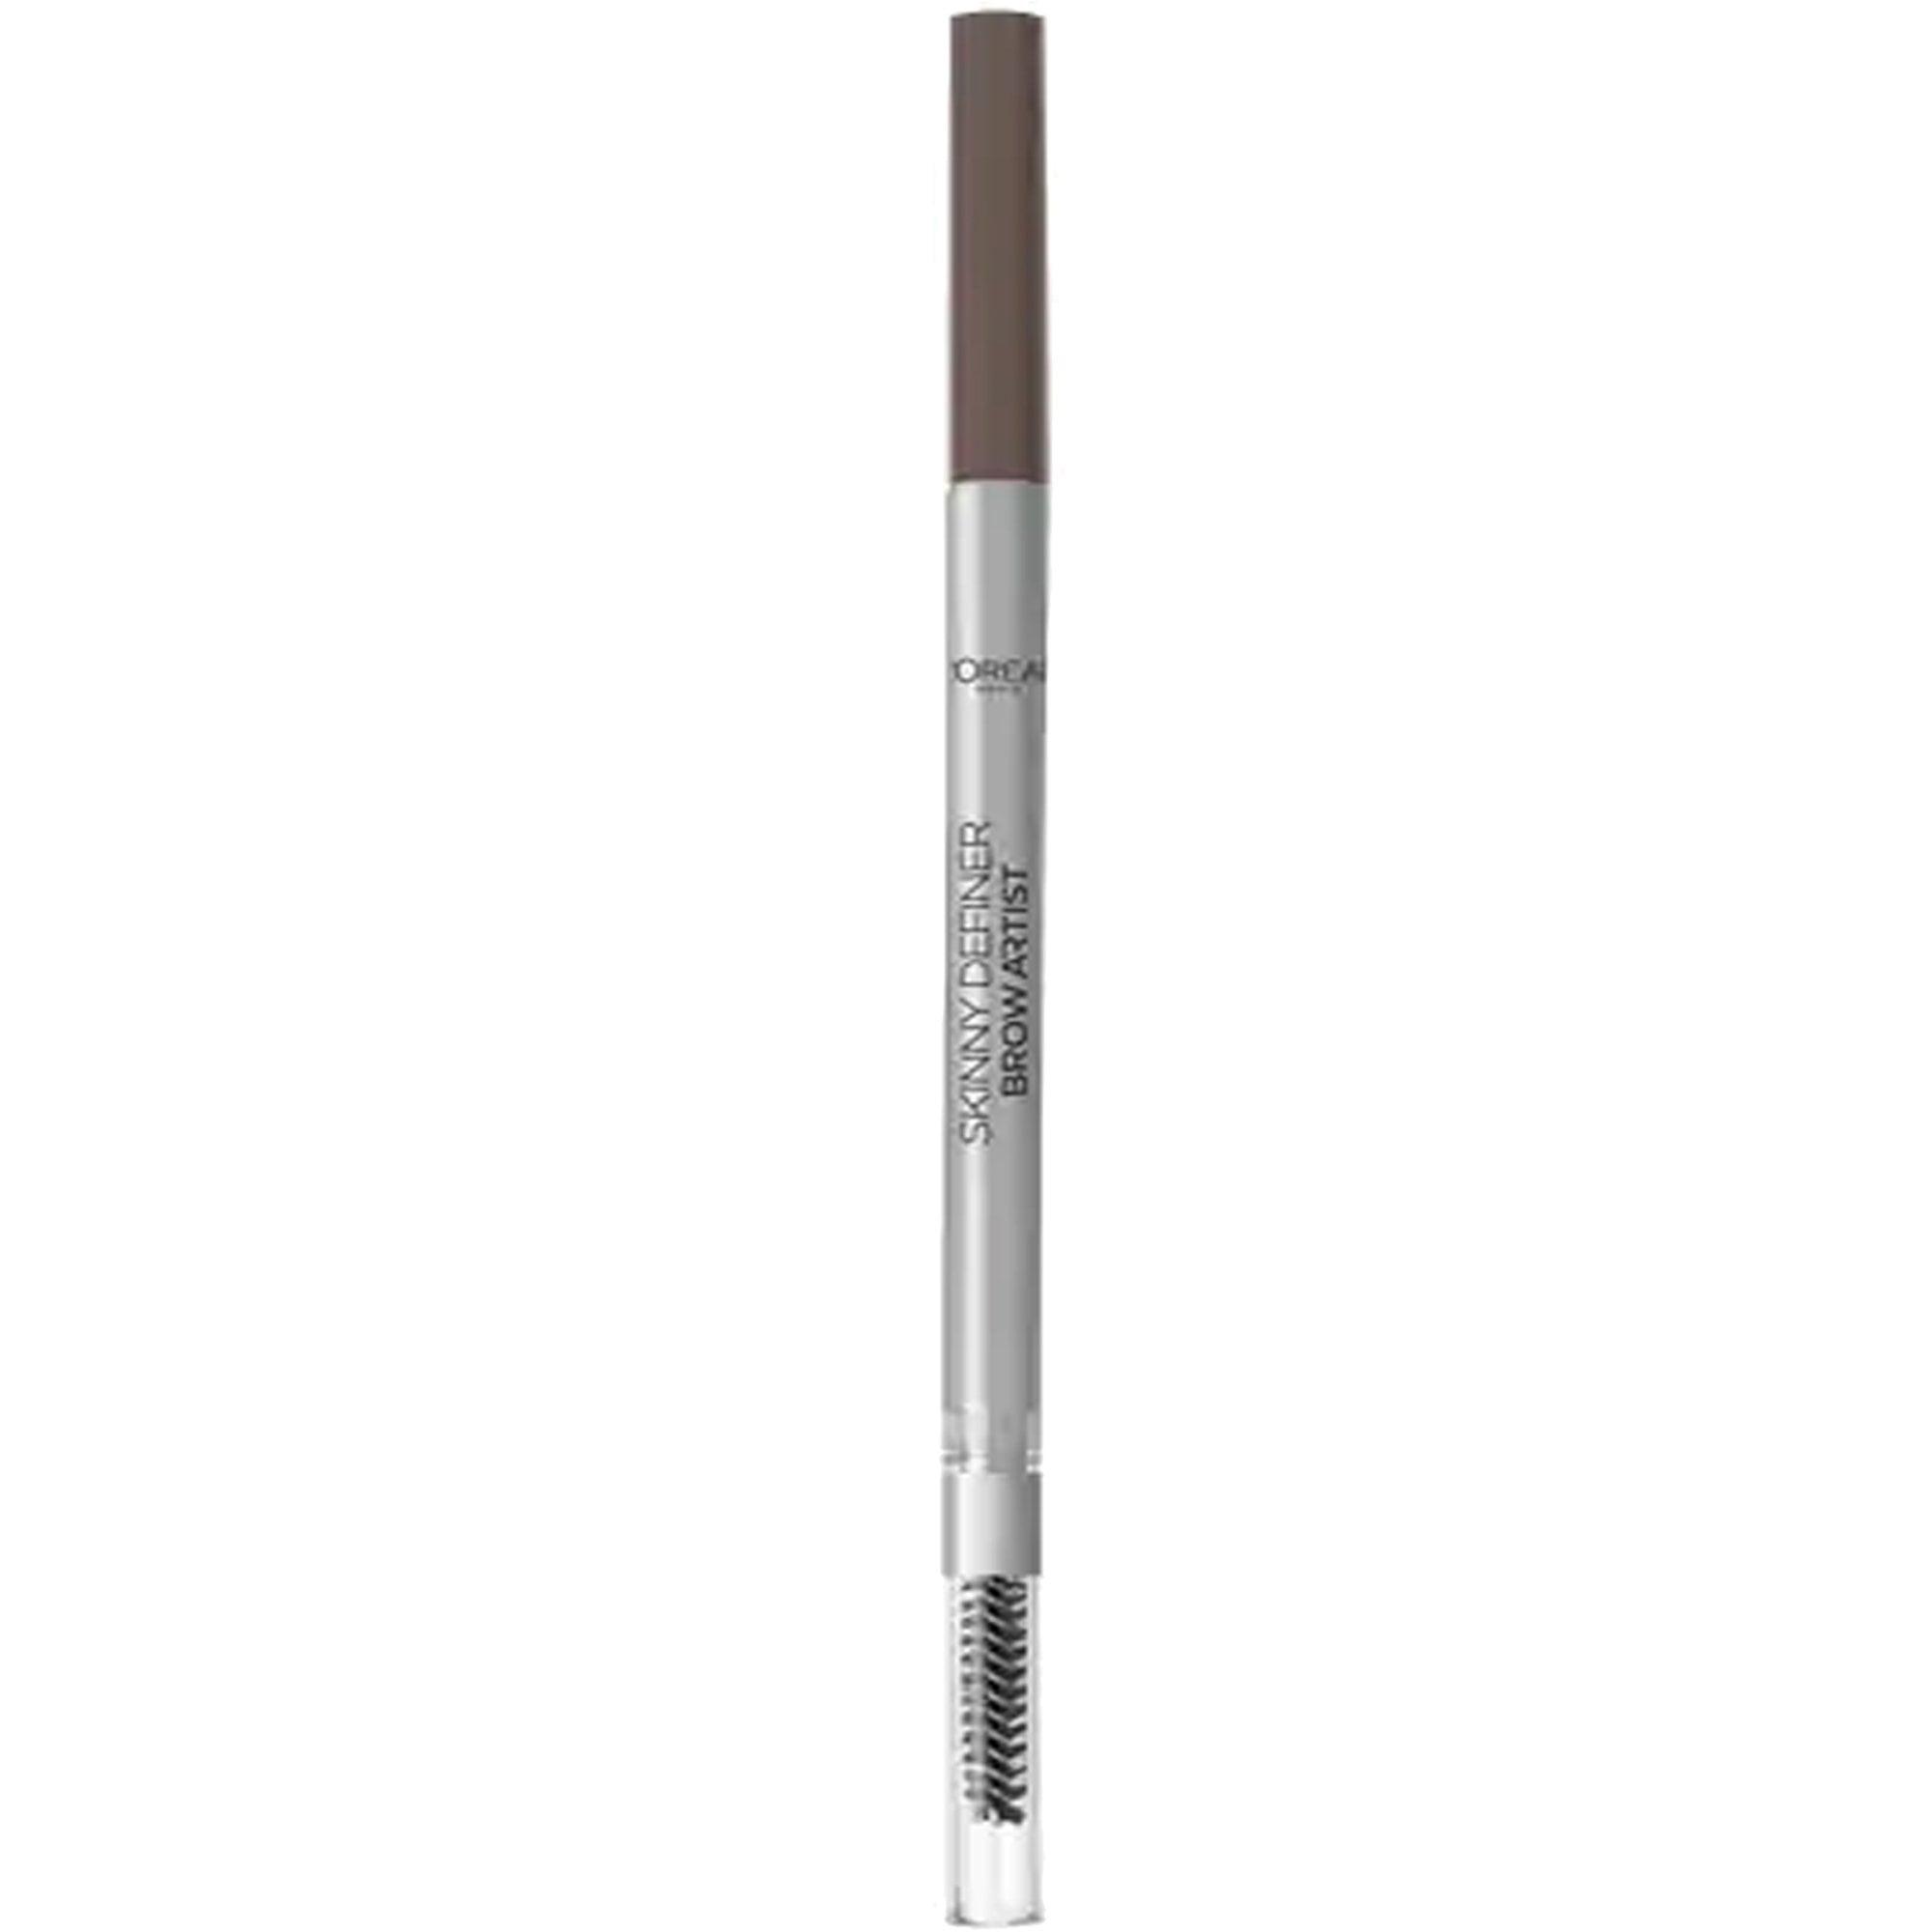 L Oreal Brow Artist Skinny Definer Eyebrow Pencil Dark Brunette 108